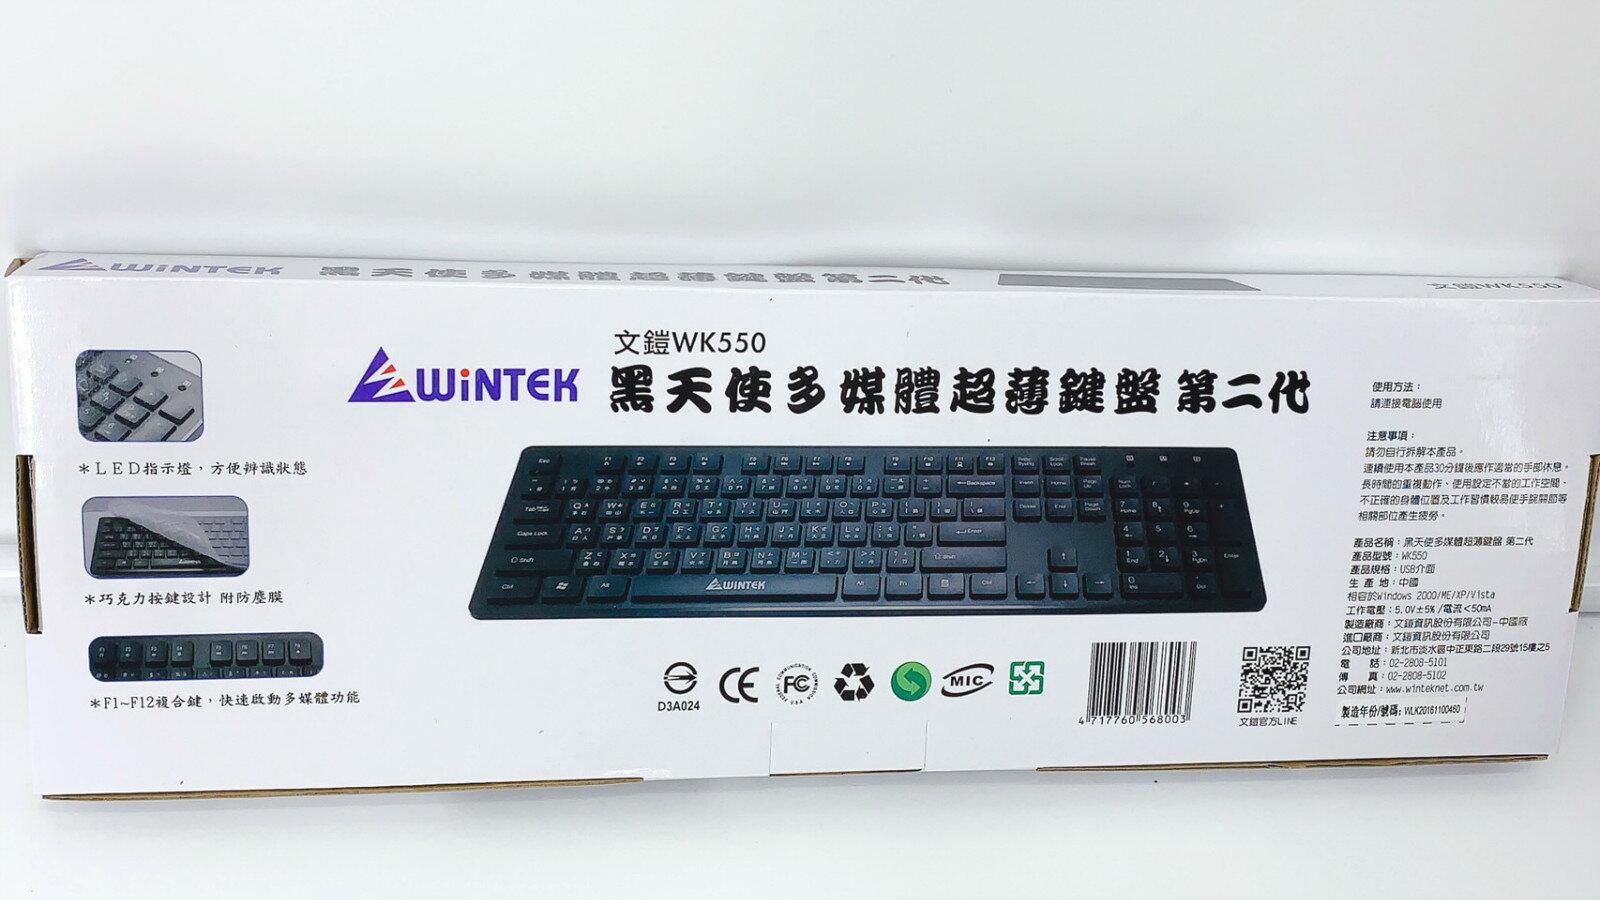 WiNTEK 文鎧 WK550 黑天使多媒體超薄鍵盤 第二代  USB 有線鍵盤